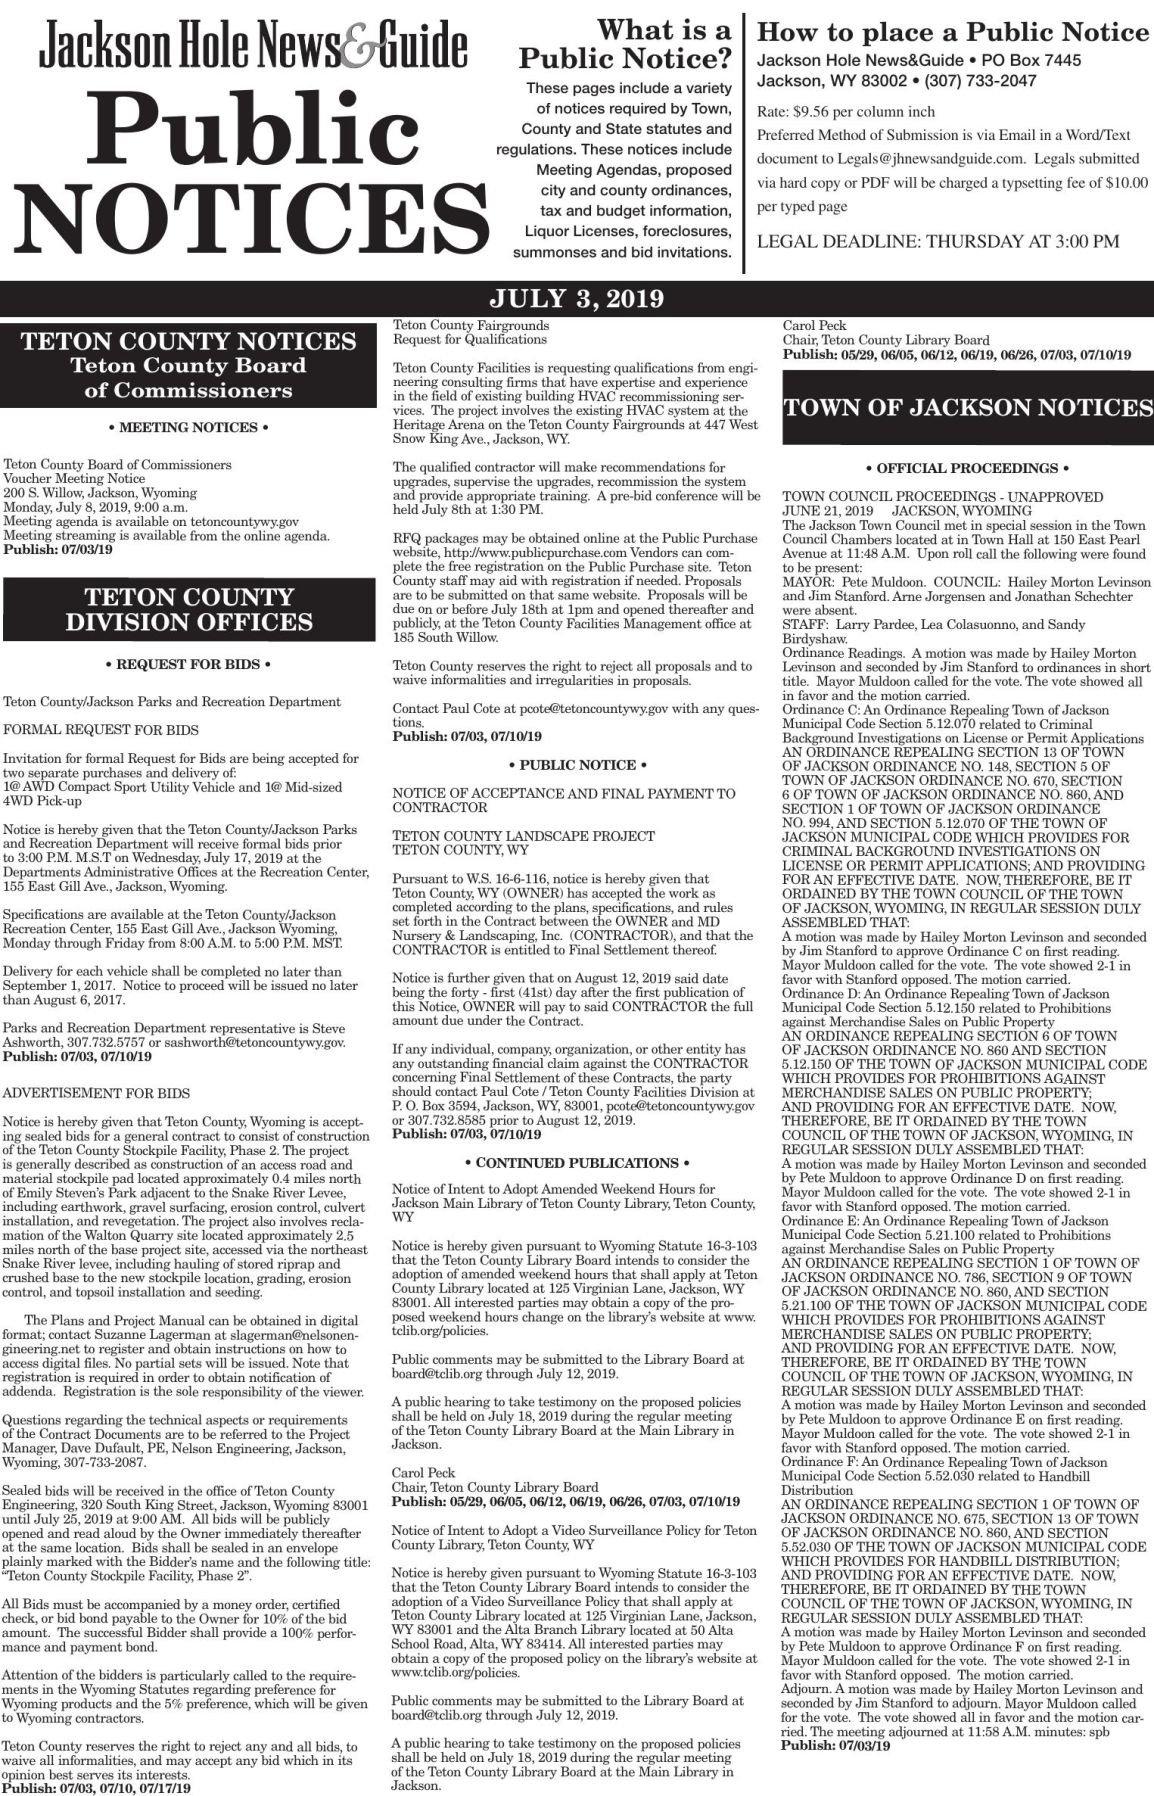 Public Notices, July 3rd, 2019